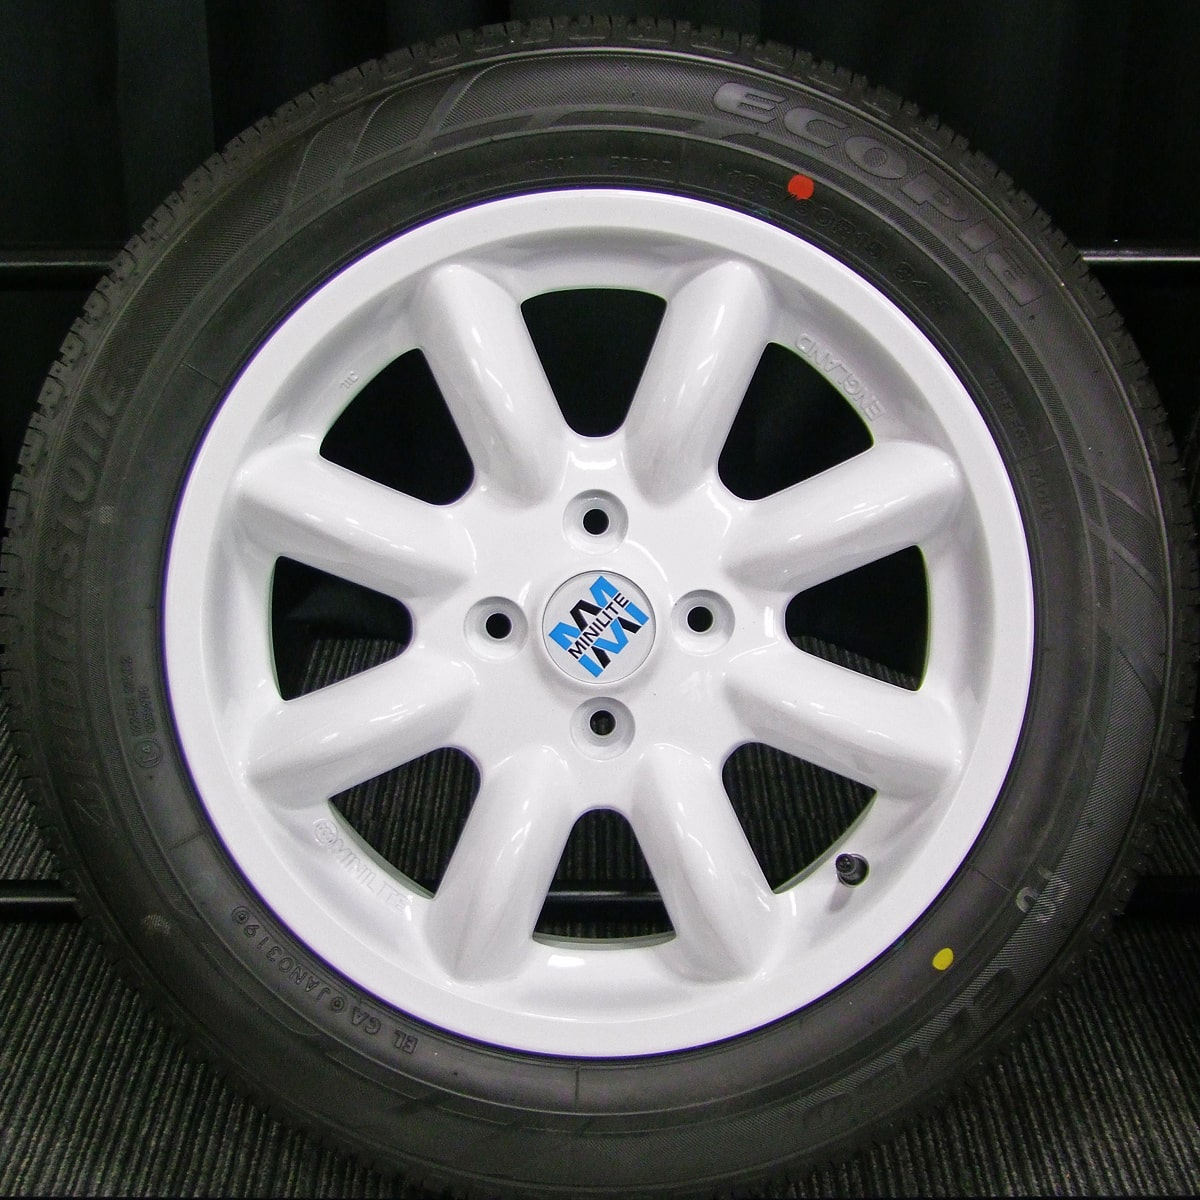 BMW MINI 純正 MINILITE ホワイト BRIDGESTONE ECOPIA EP150 185/60R15 4本SET